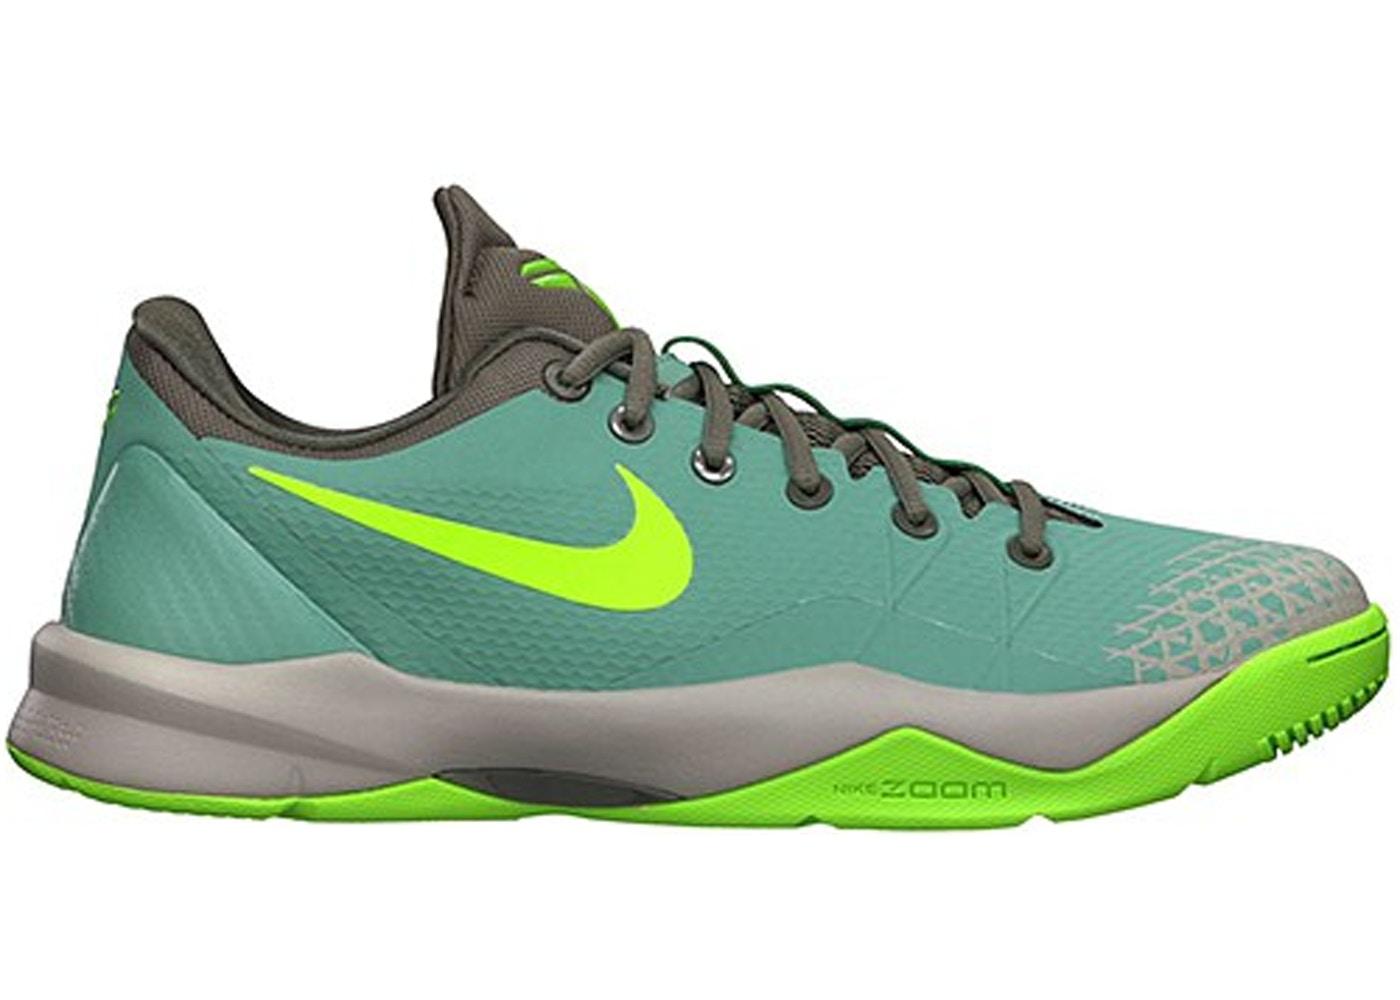 Mujer hermosa Ingenieria Mirar  Nike Zoom Kobe Venomenon 4 Diffused Jade - 635578-300